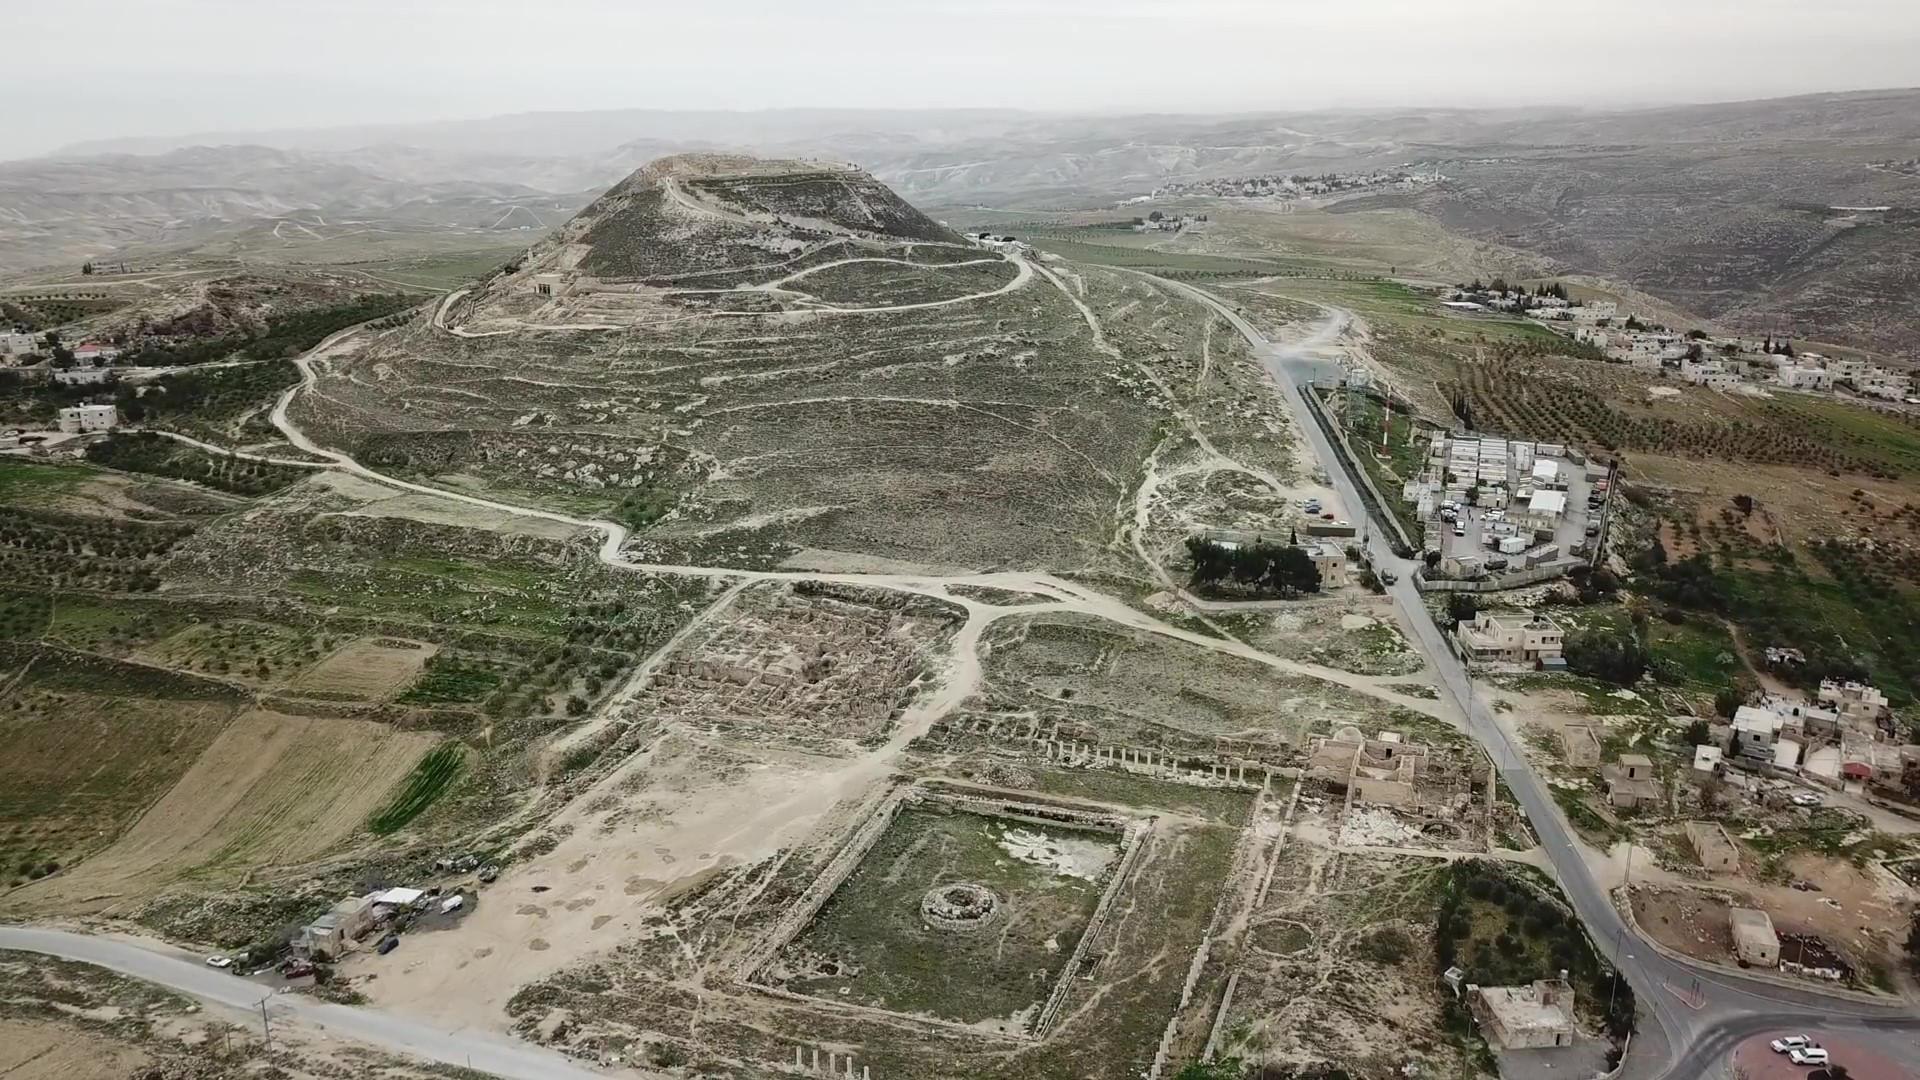 Herodion Aerial Views 1_Moment4.jpg